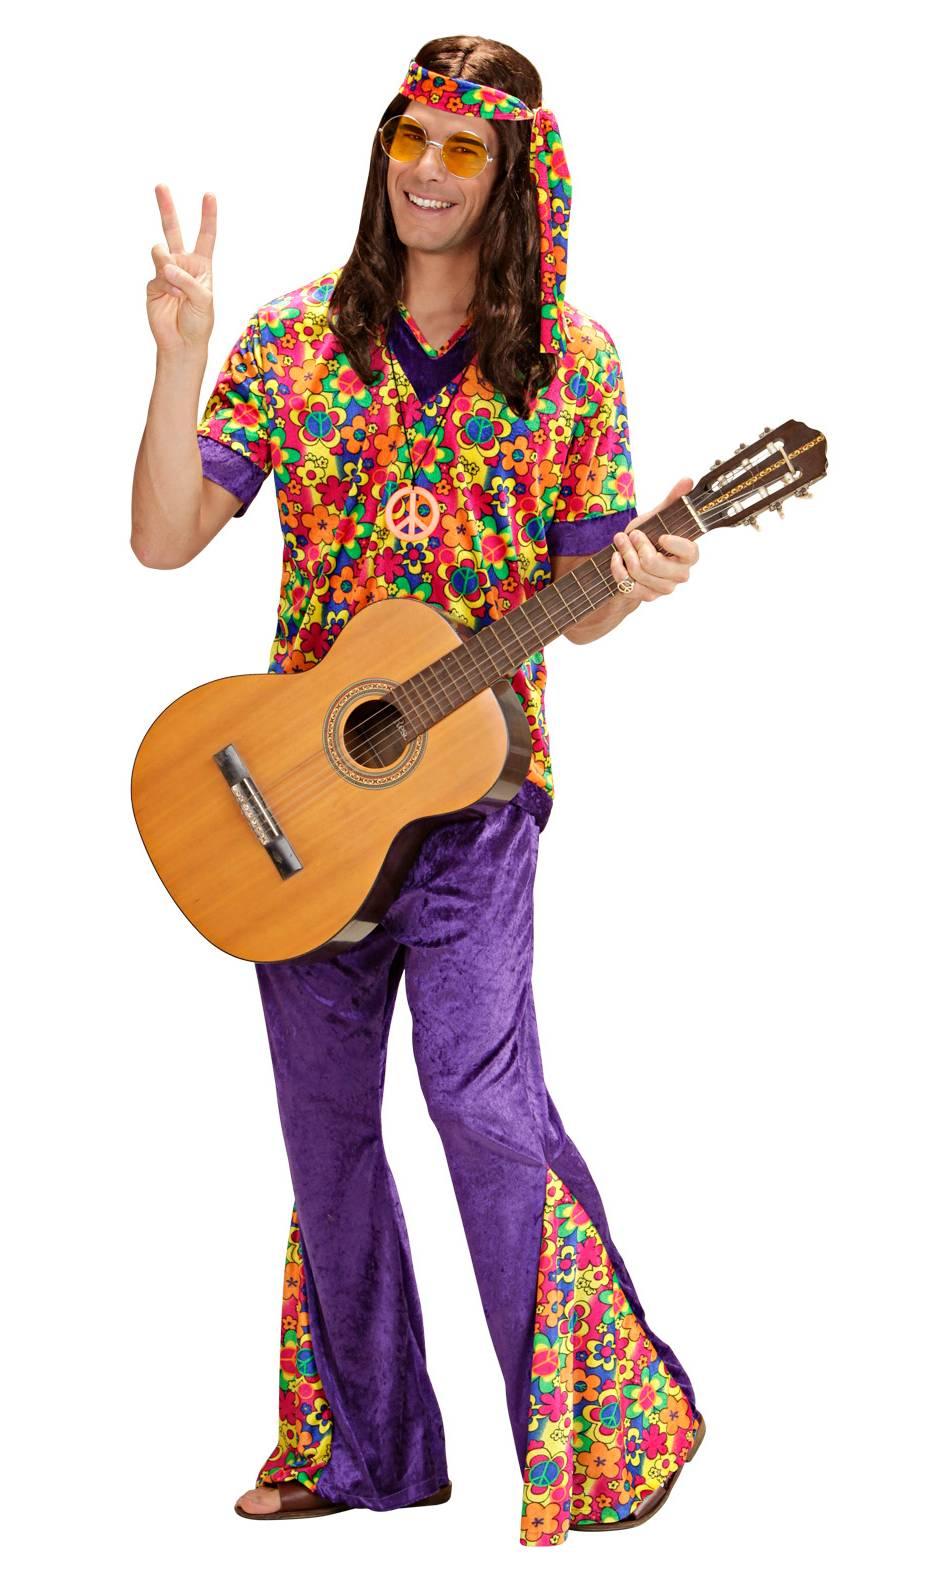 chemises hippies homme chemise hippie homme deguisement flower power hippie homme hippie flower powe. Black Bedroom Furniture Sets. Home Design Ideas